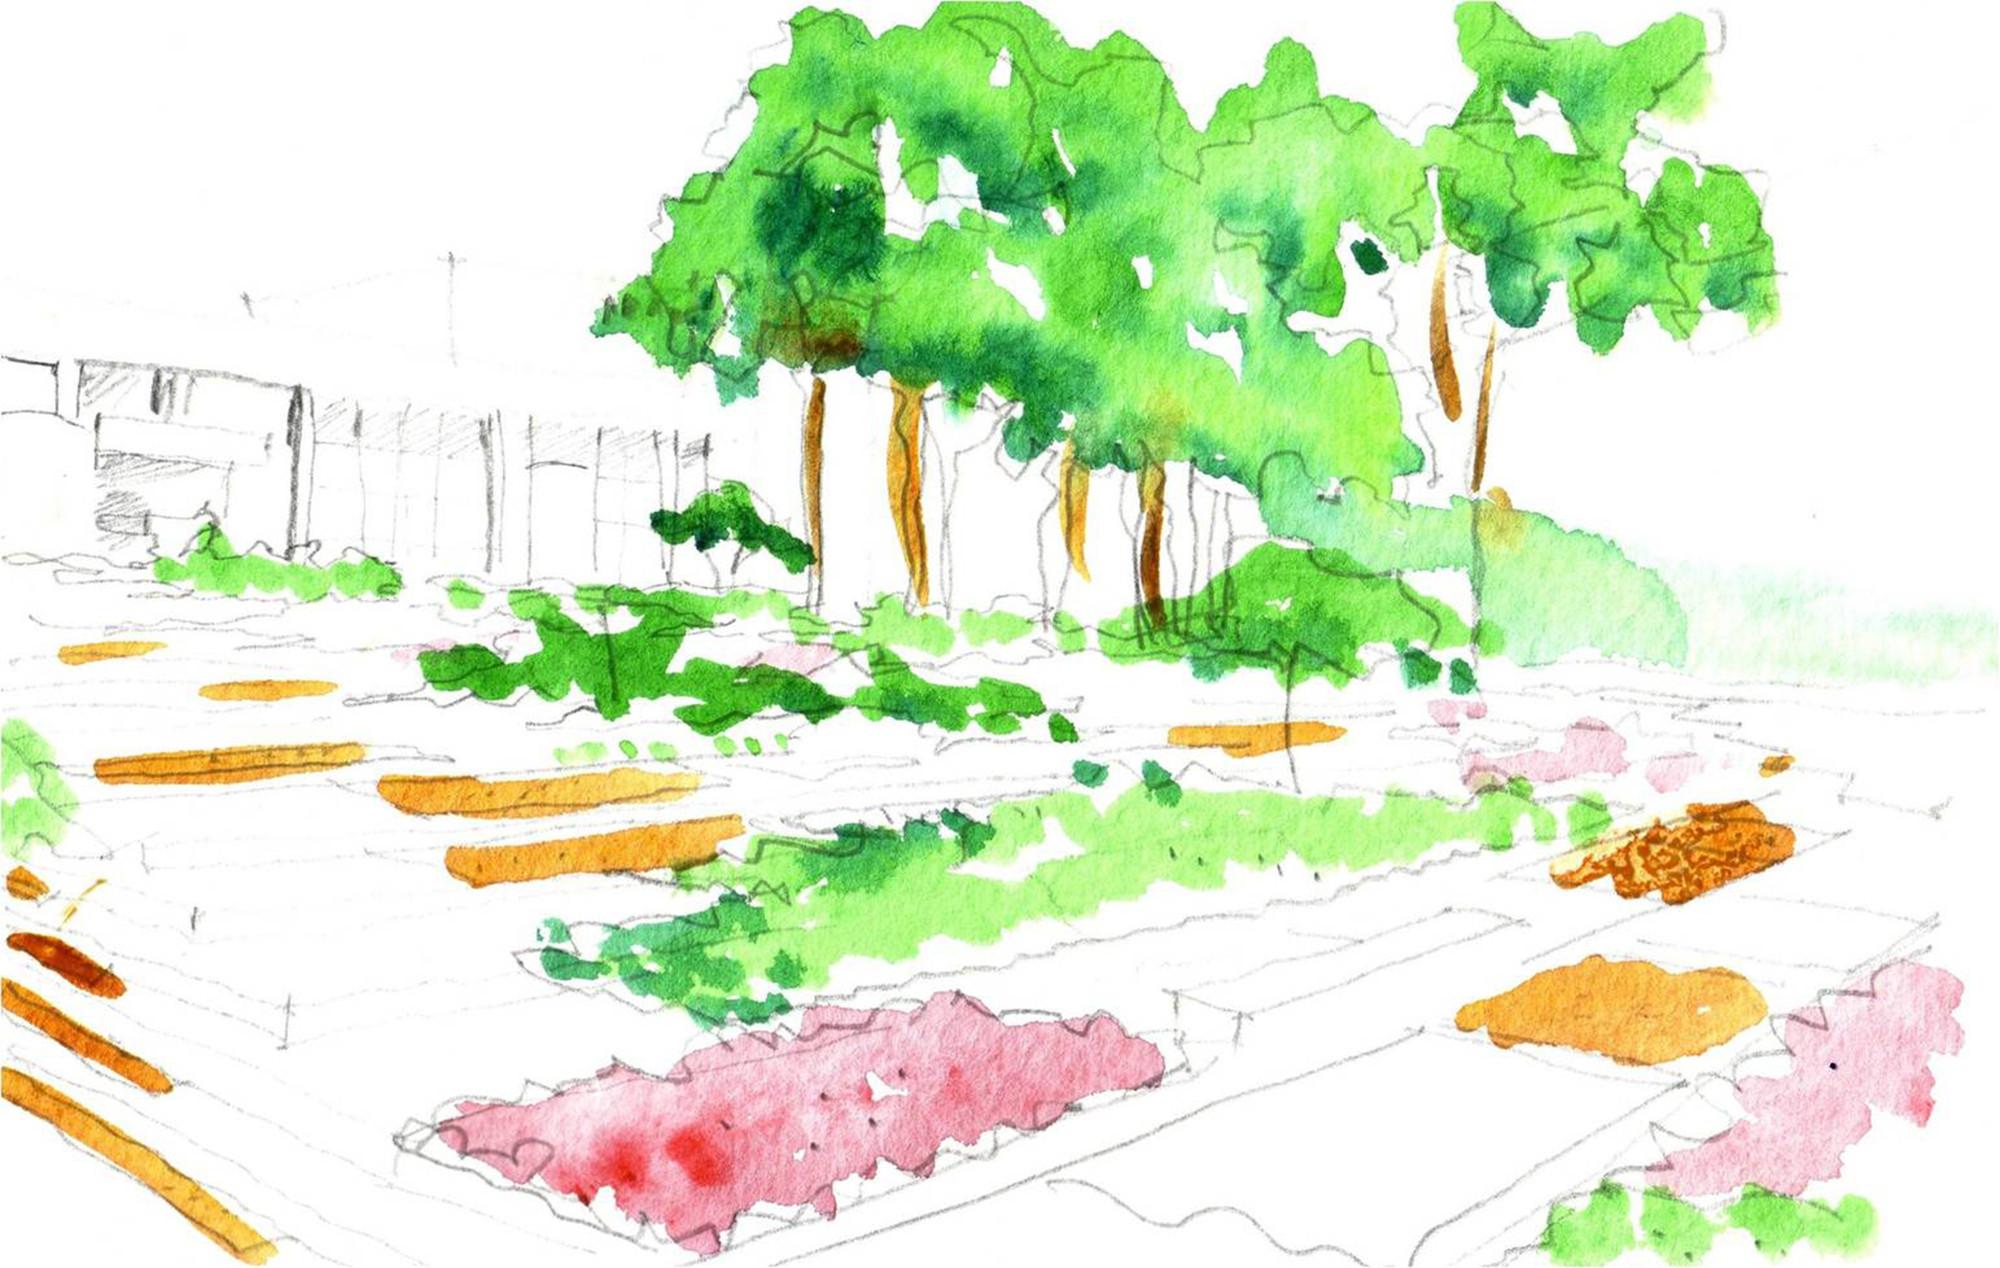 Arquitectura y paisaje espacios verdes colectivos para for Arquitectura del paisaje